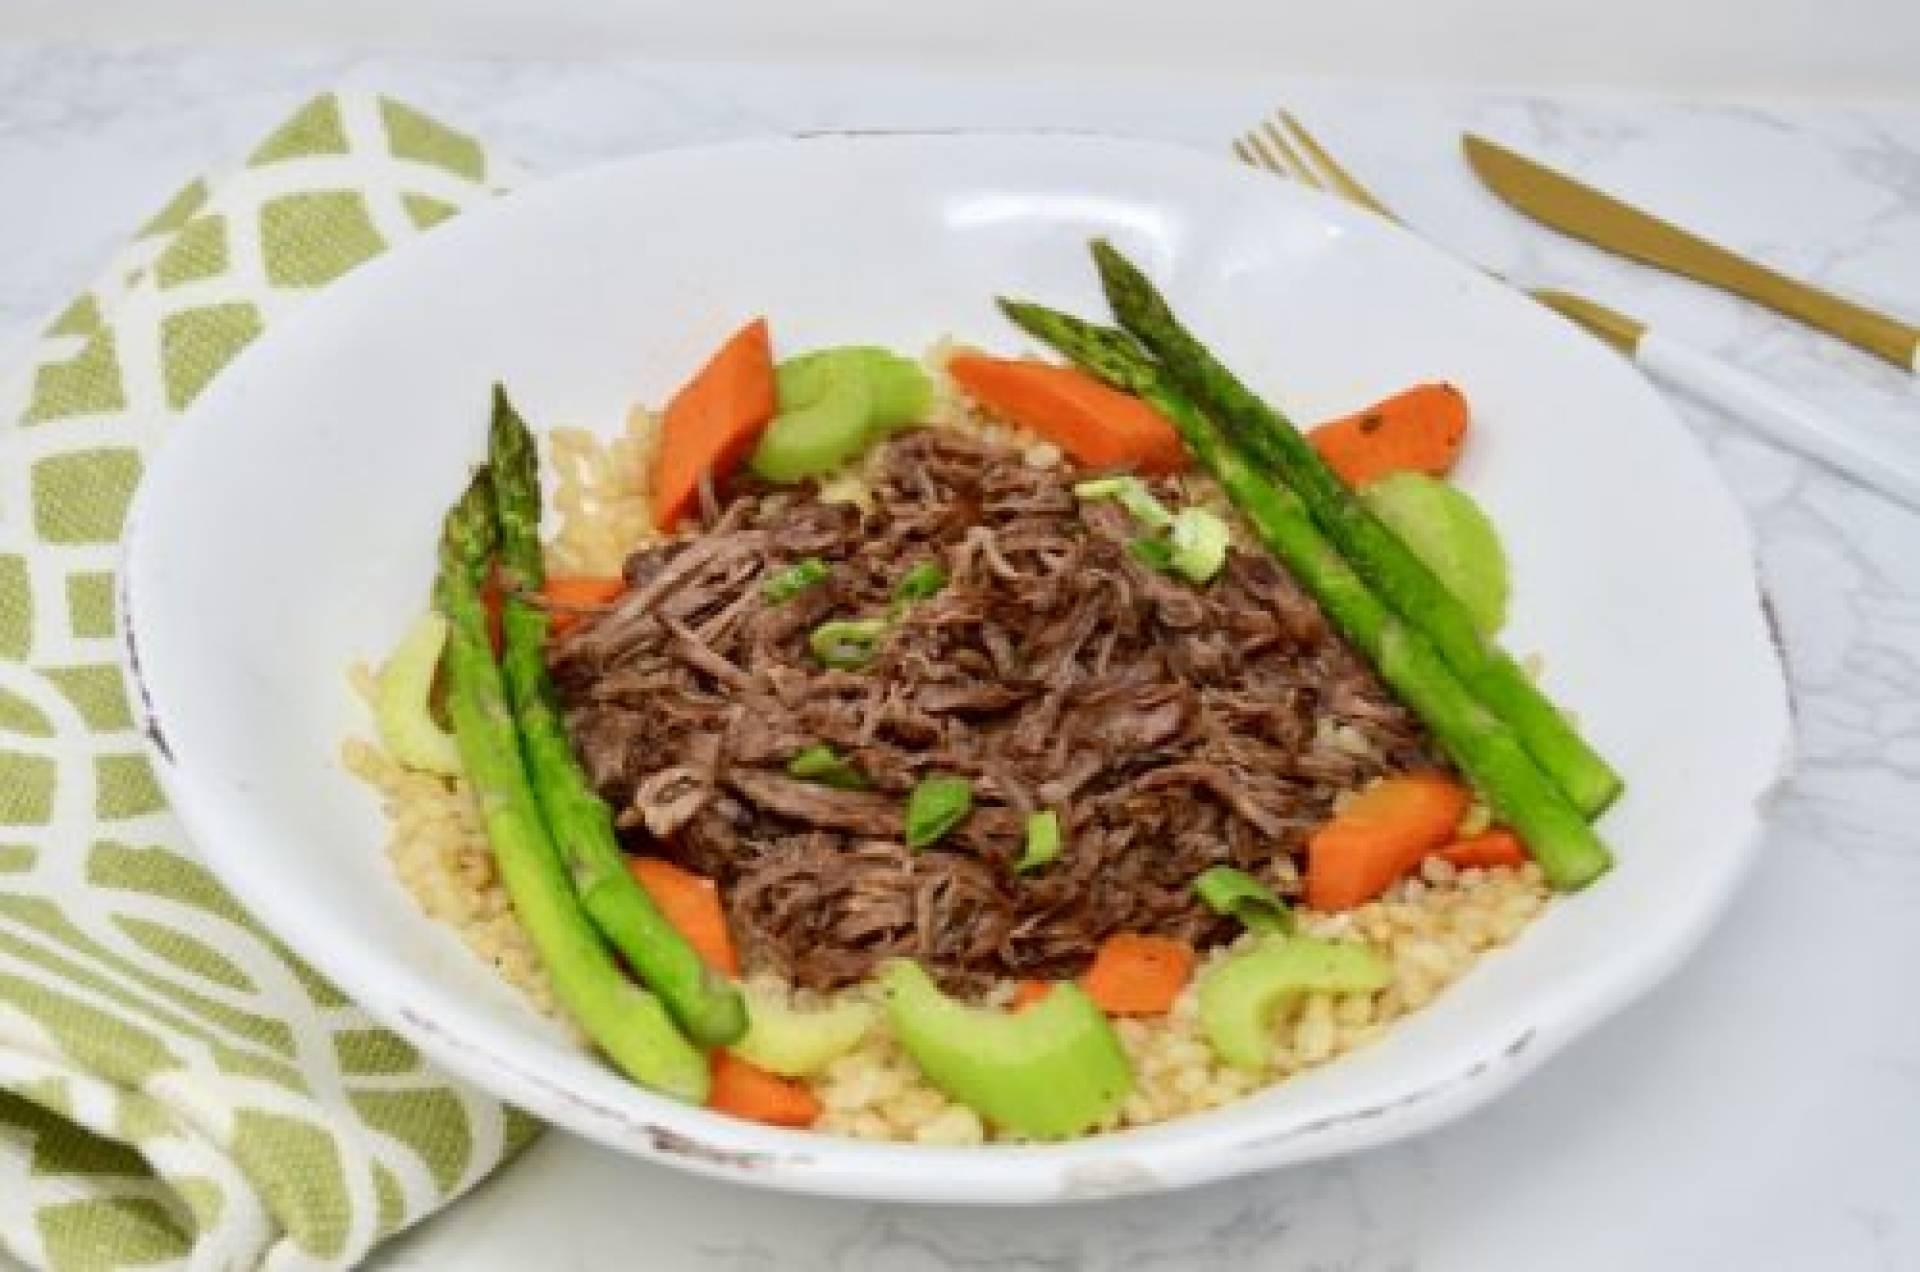 Savory Chuck Roast with Brown Rice